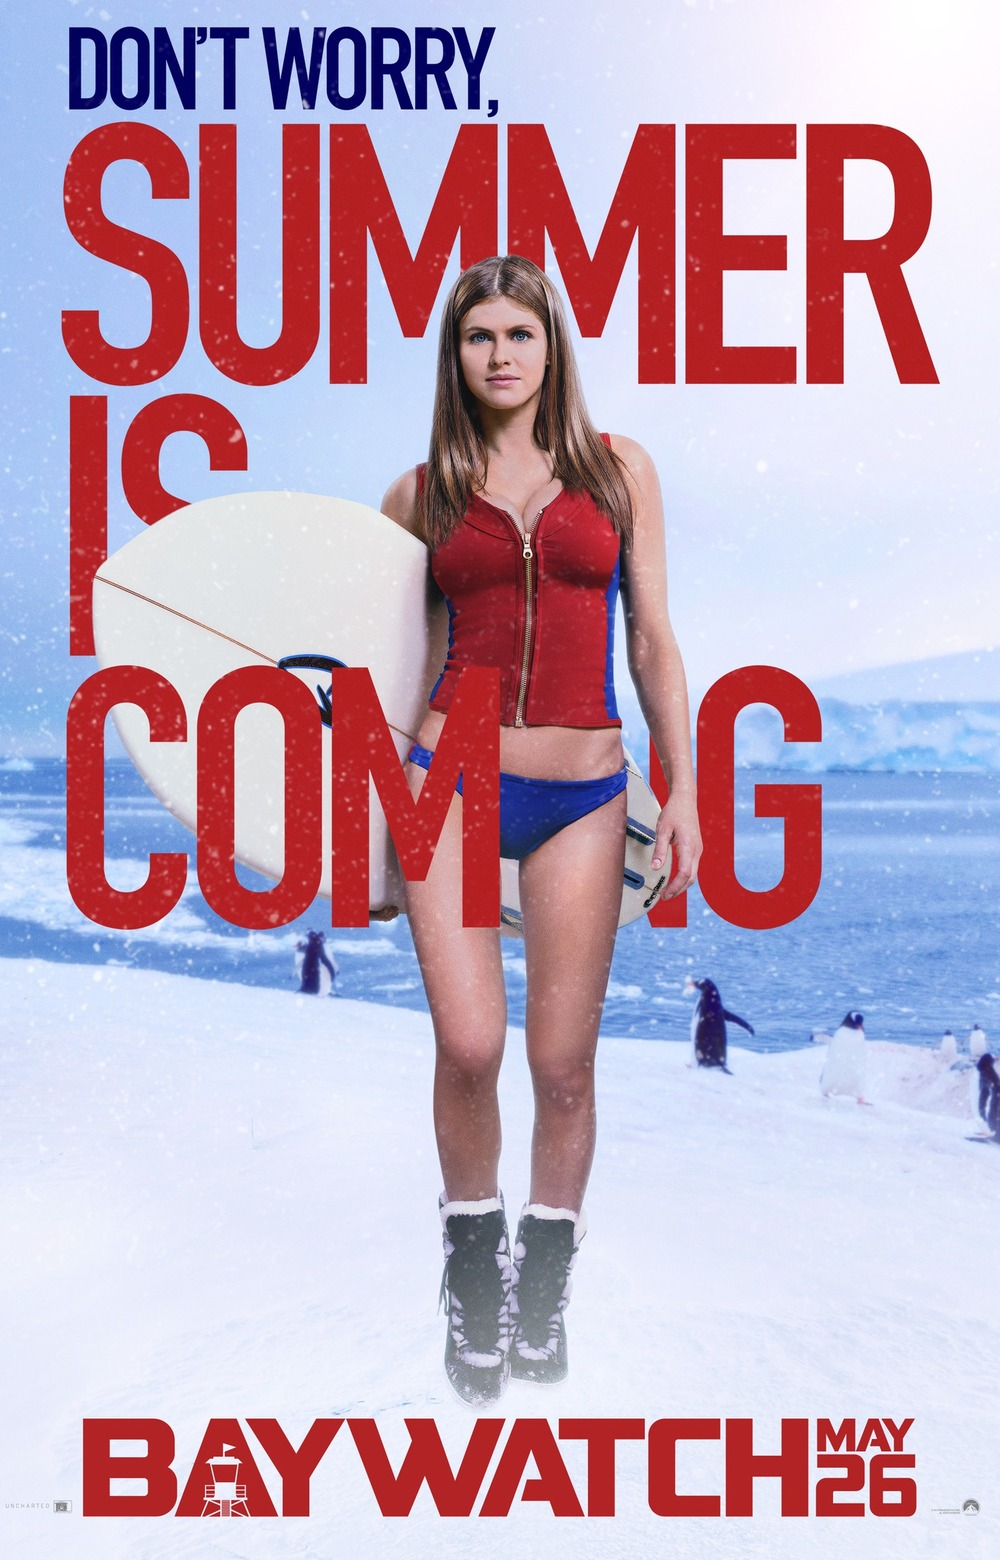 Boat Trailer Rental >> Baywatch DVD Release Date | Redbox, Netflix, iTunes, Amazon